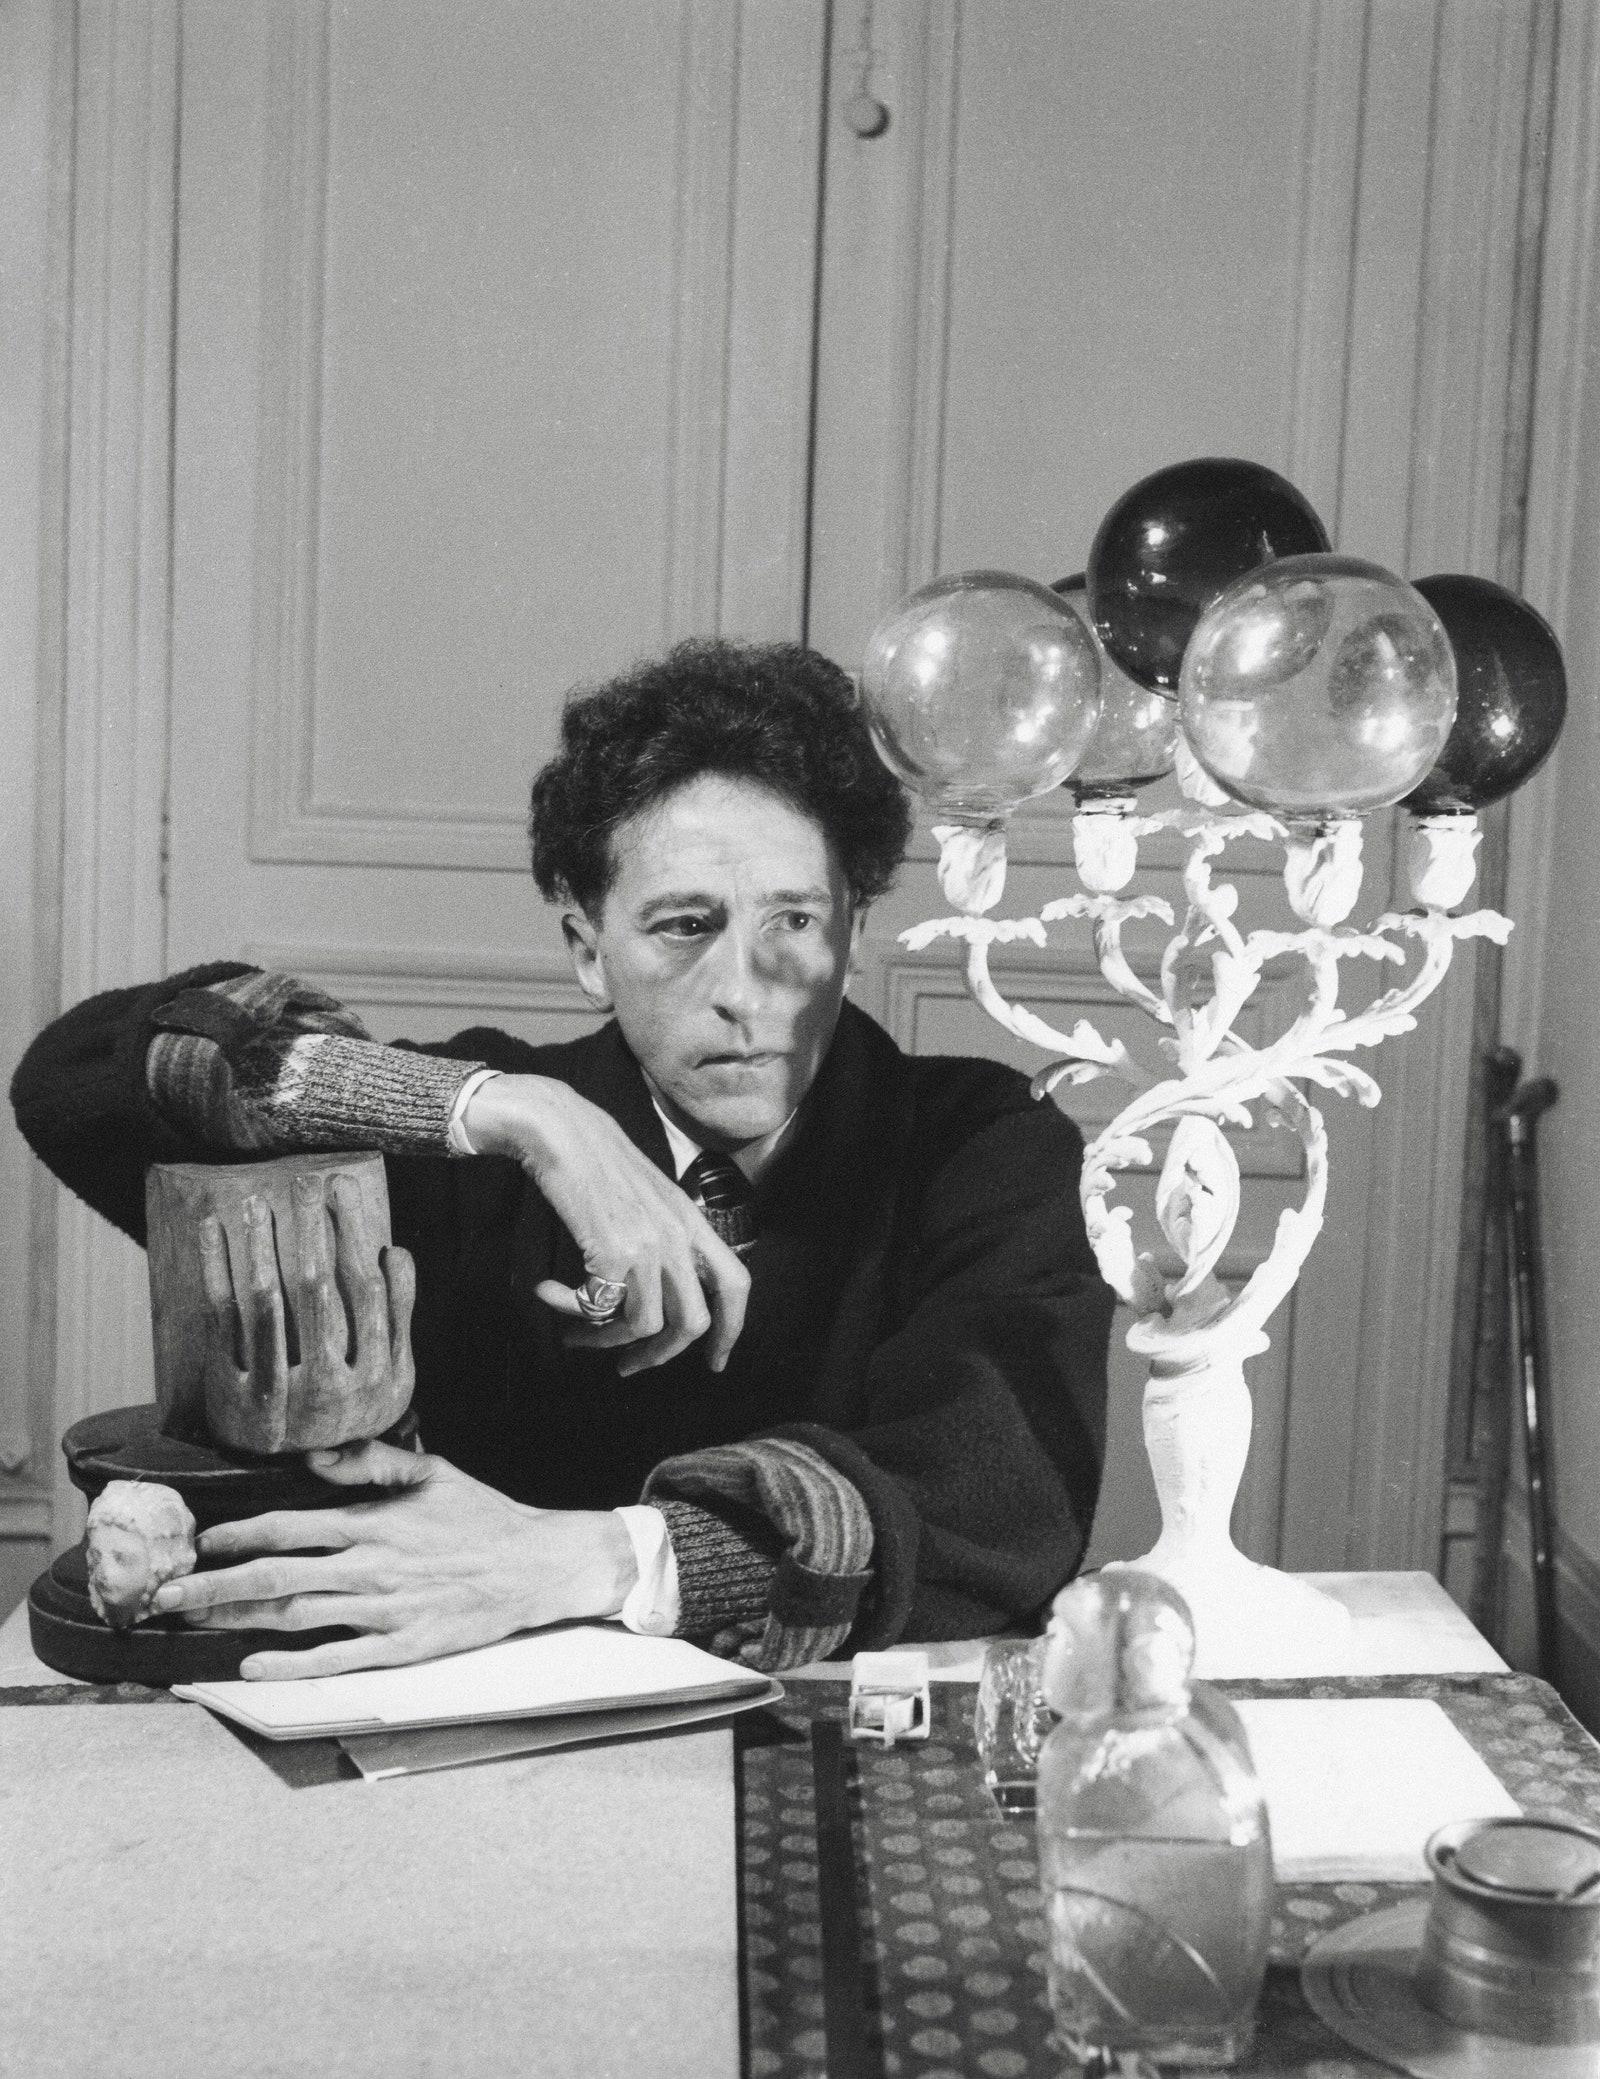 Serge Lido Photography. Jean Cocteau  Dans Sa Maison Paris 1939. Silver gelatine print.